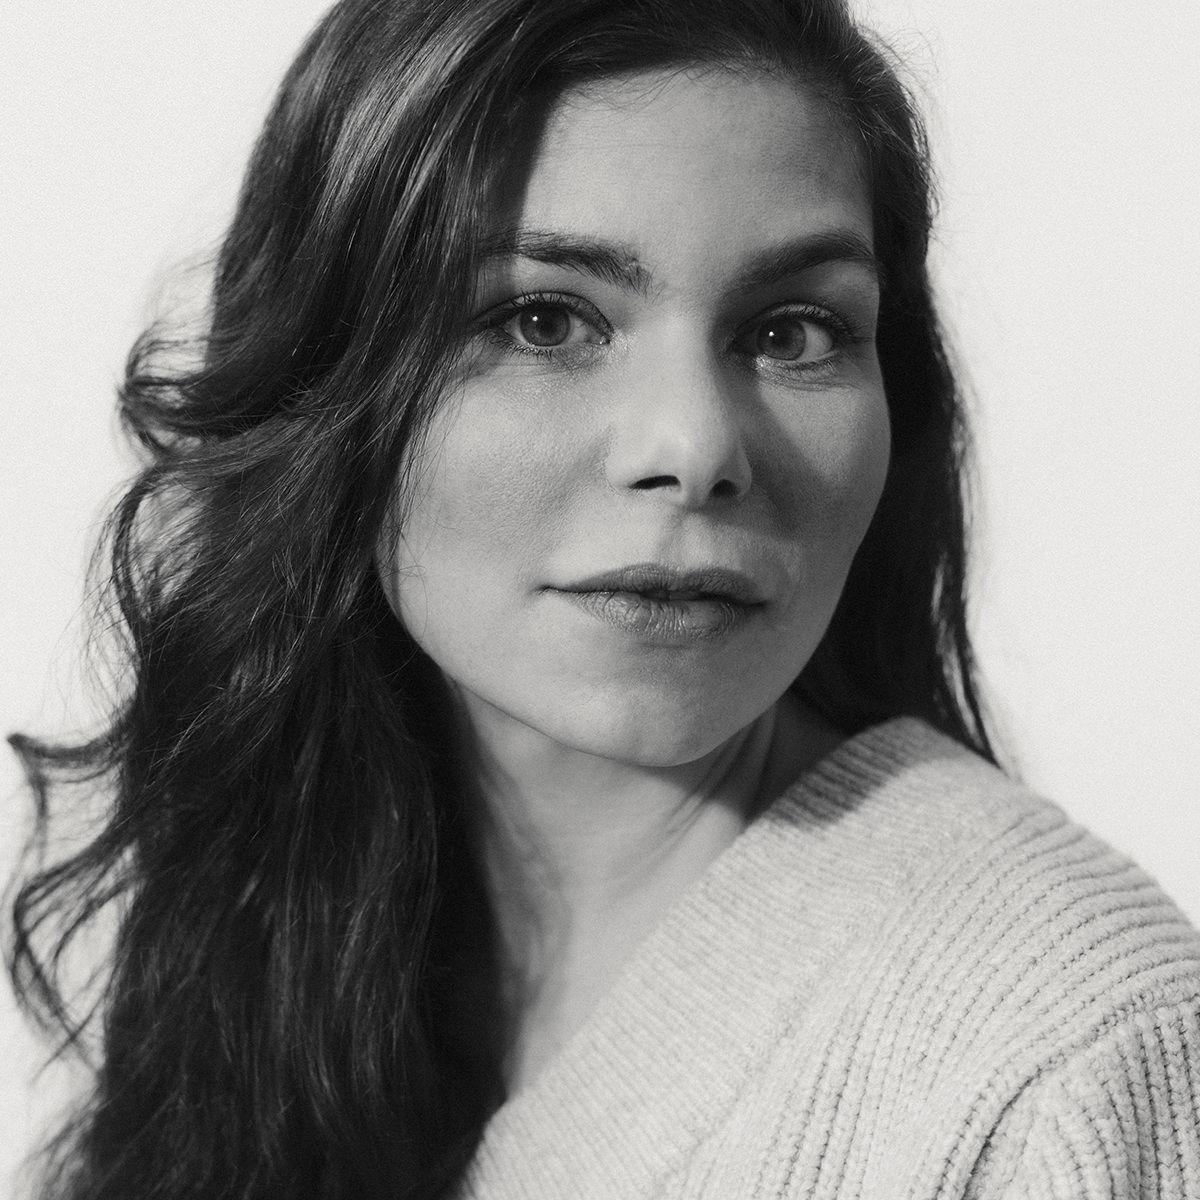 Sonja Maria